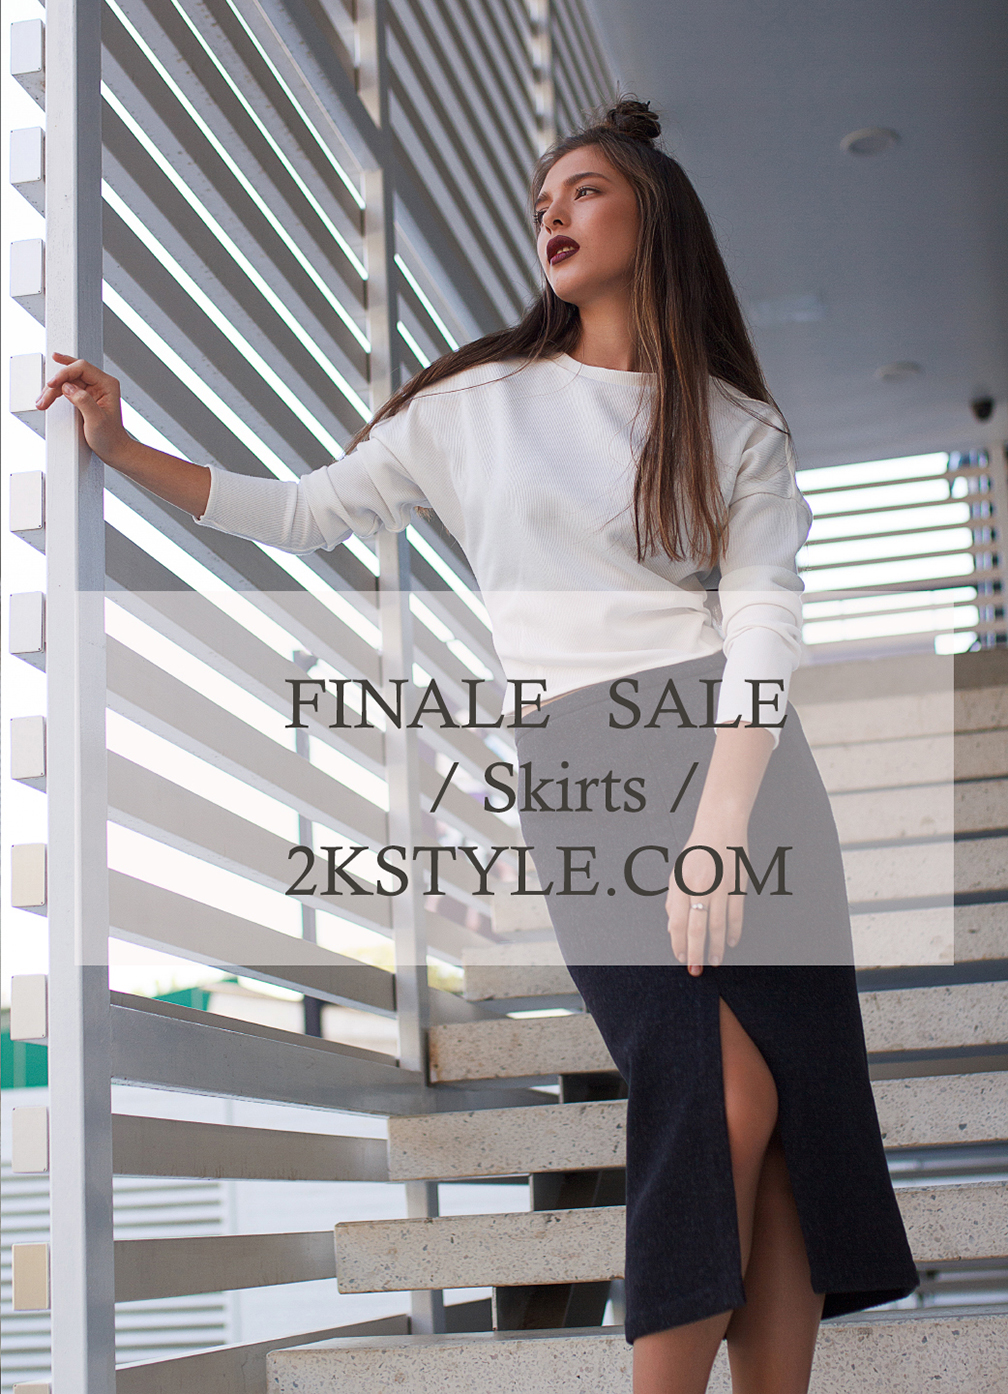 Final sale skirtst